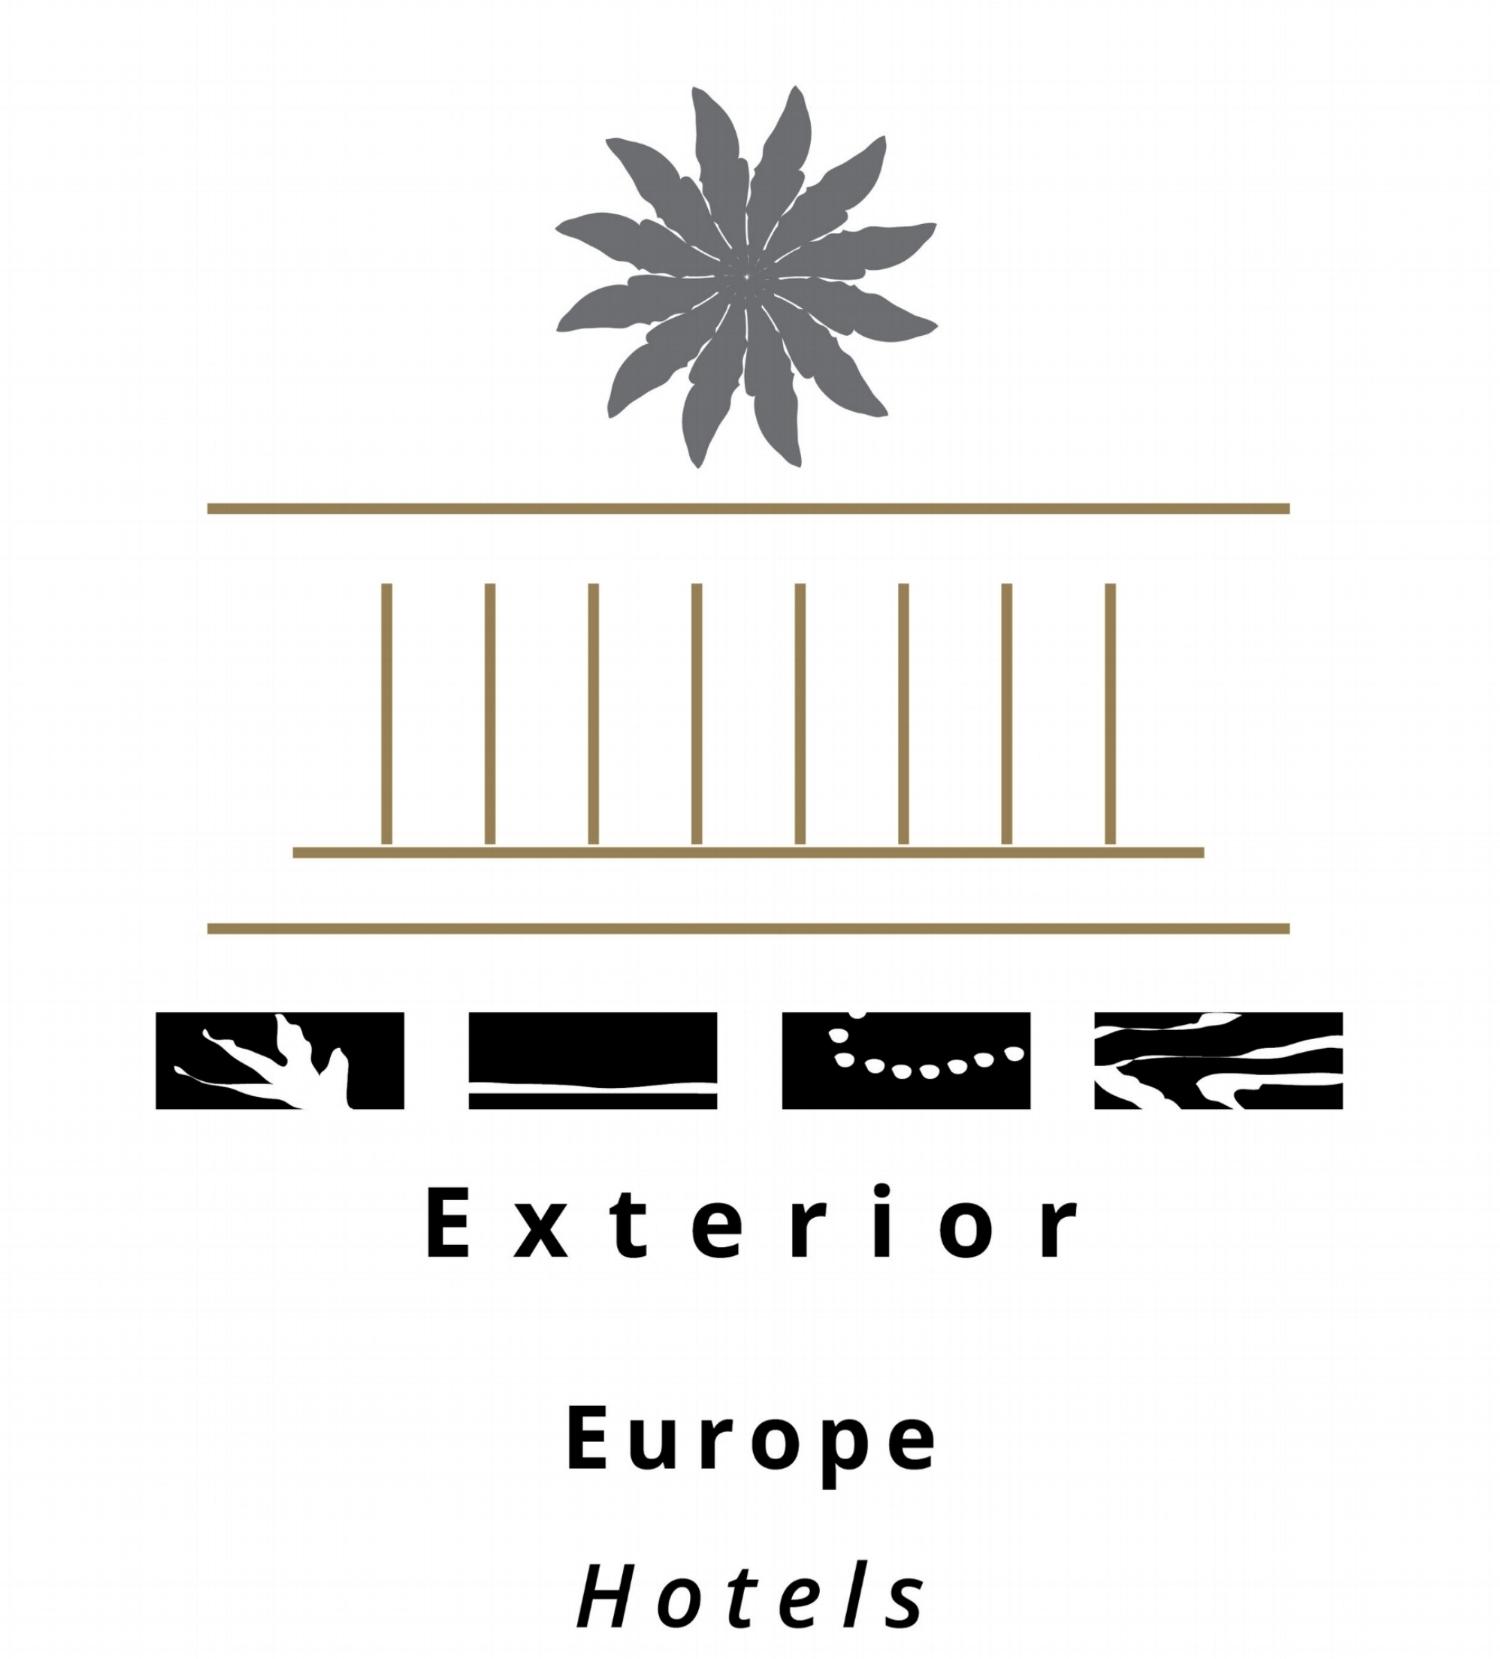 casa cook kos -  prix versailles 2018  -  continental winner EUROPE  for an exterior / hotels category